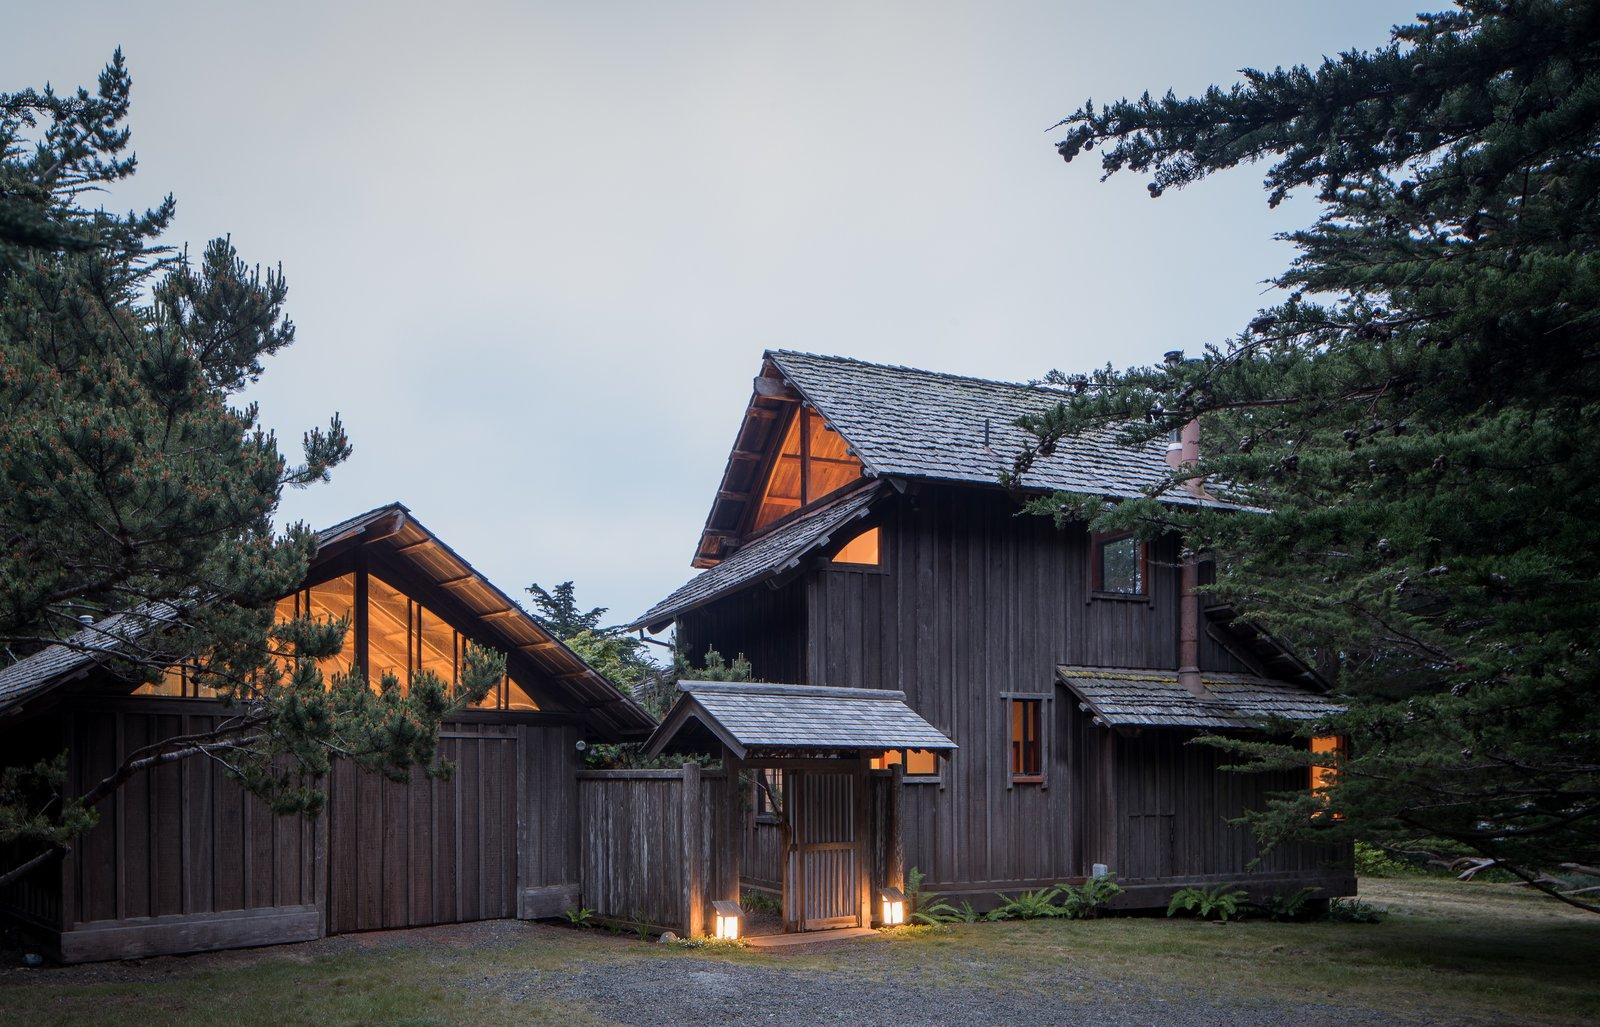 Hinoki House Modern Home In Mendocino California By Zippy